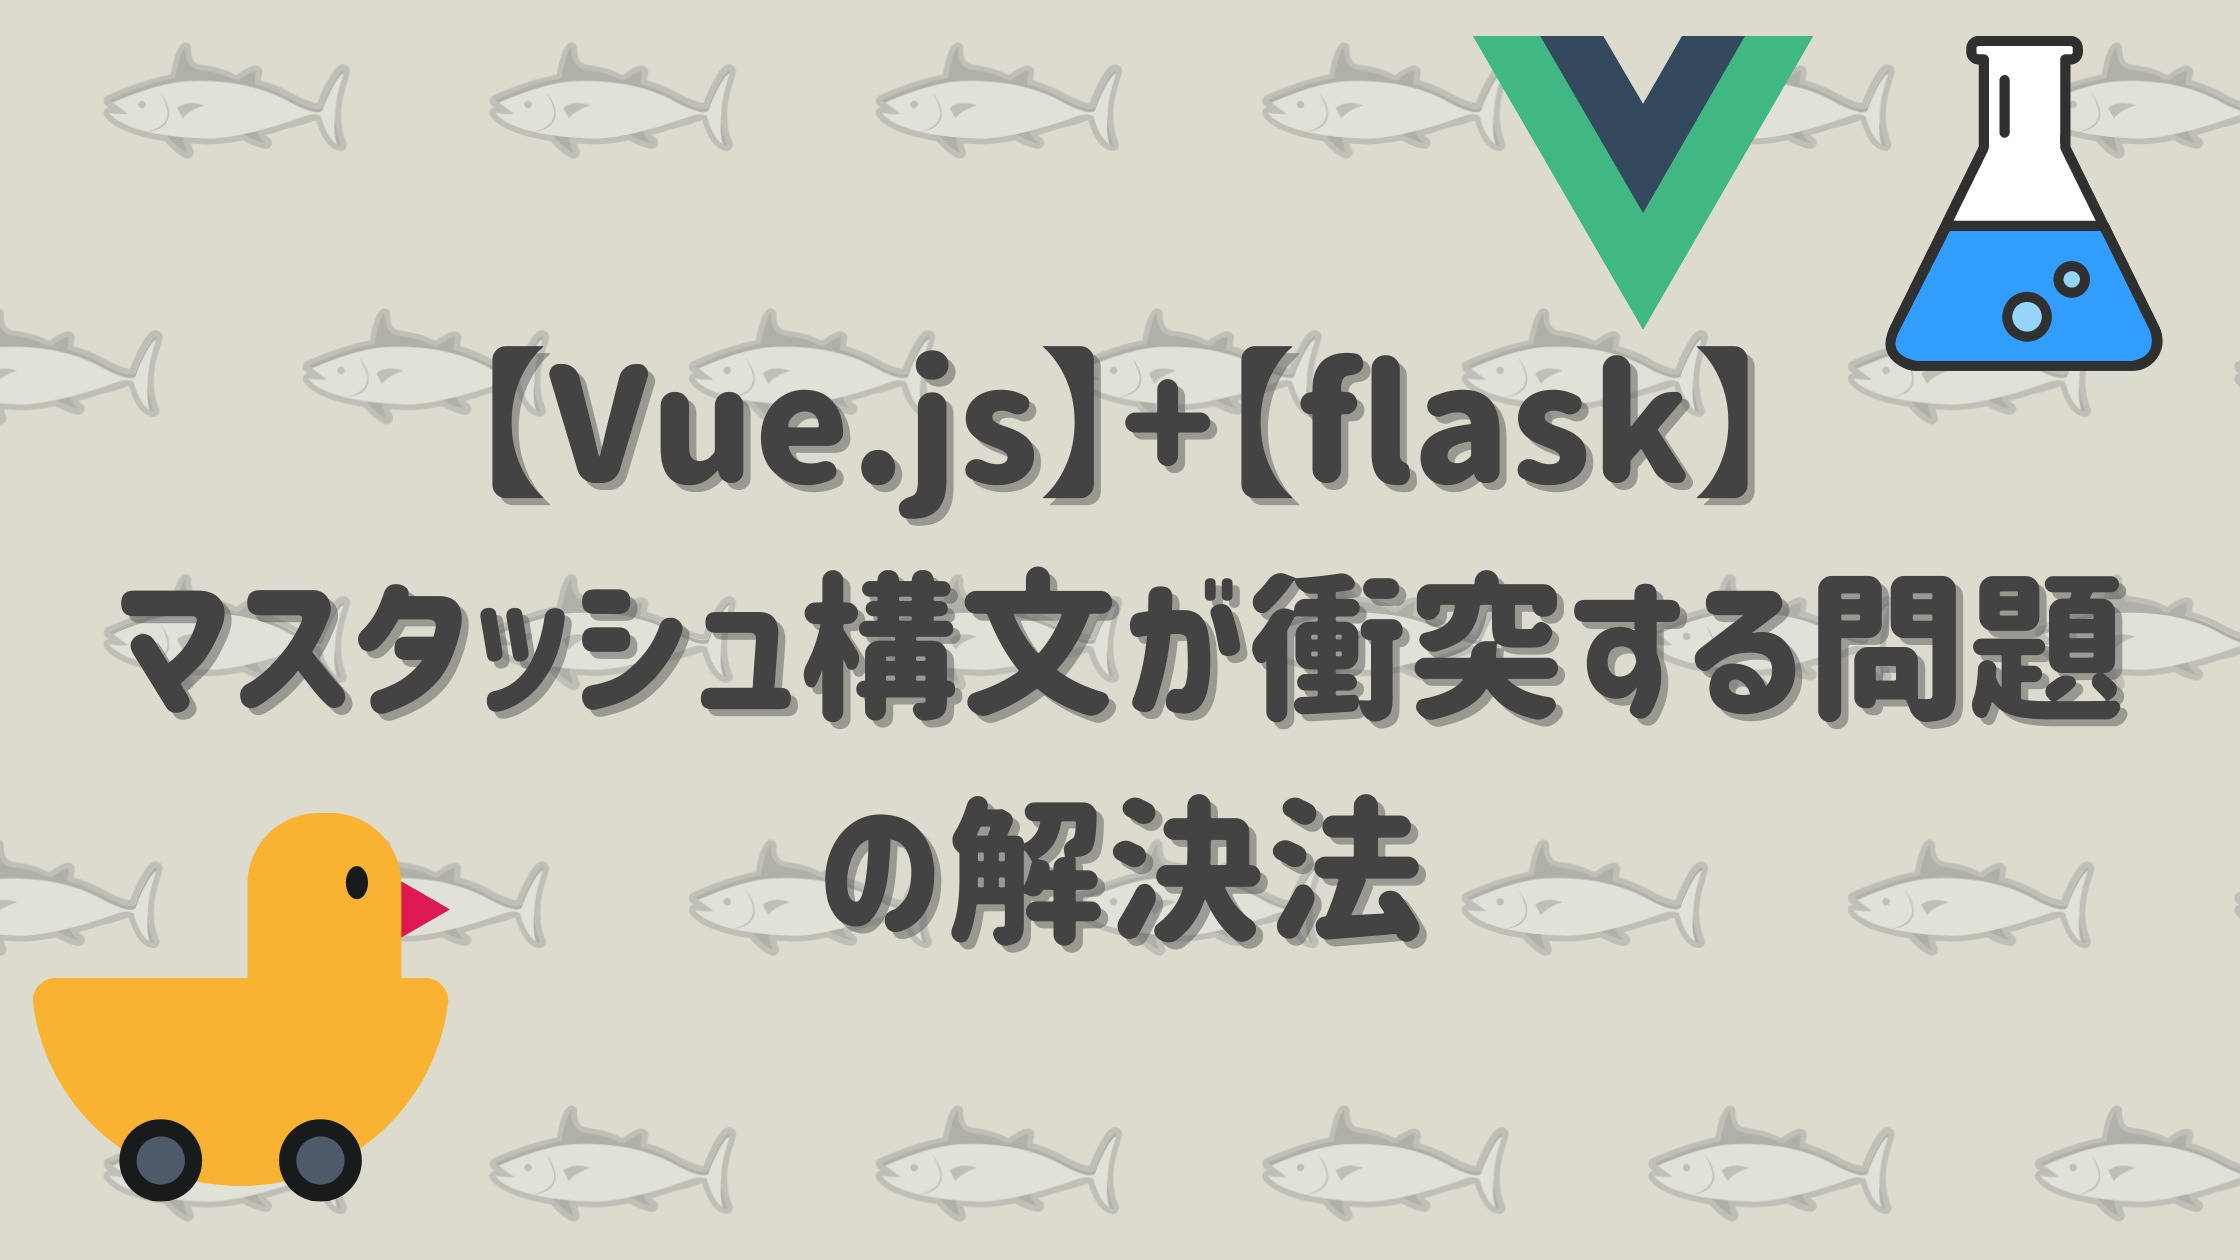 vueとflaskでマスタッシュが衝突する記事のアイキャッチ